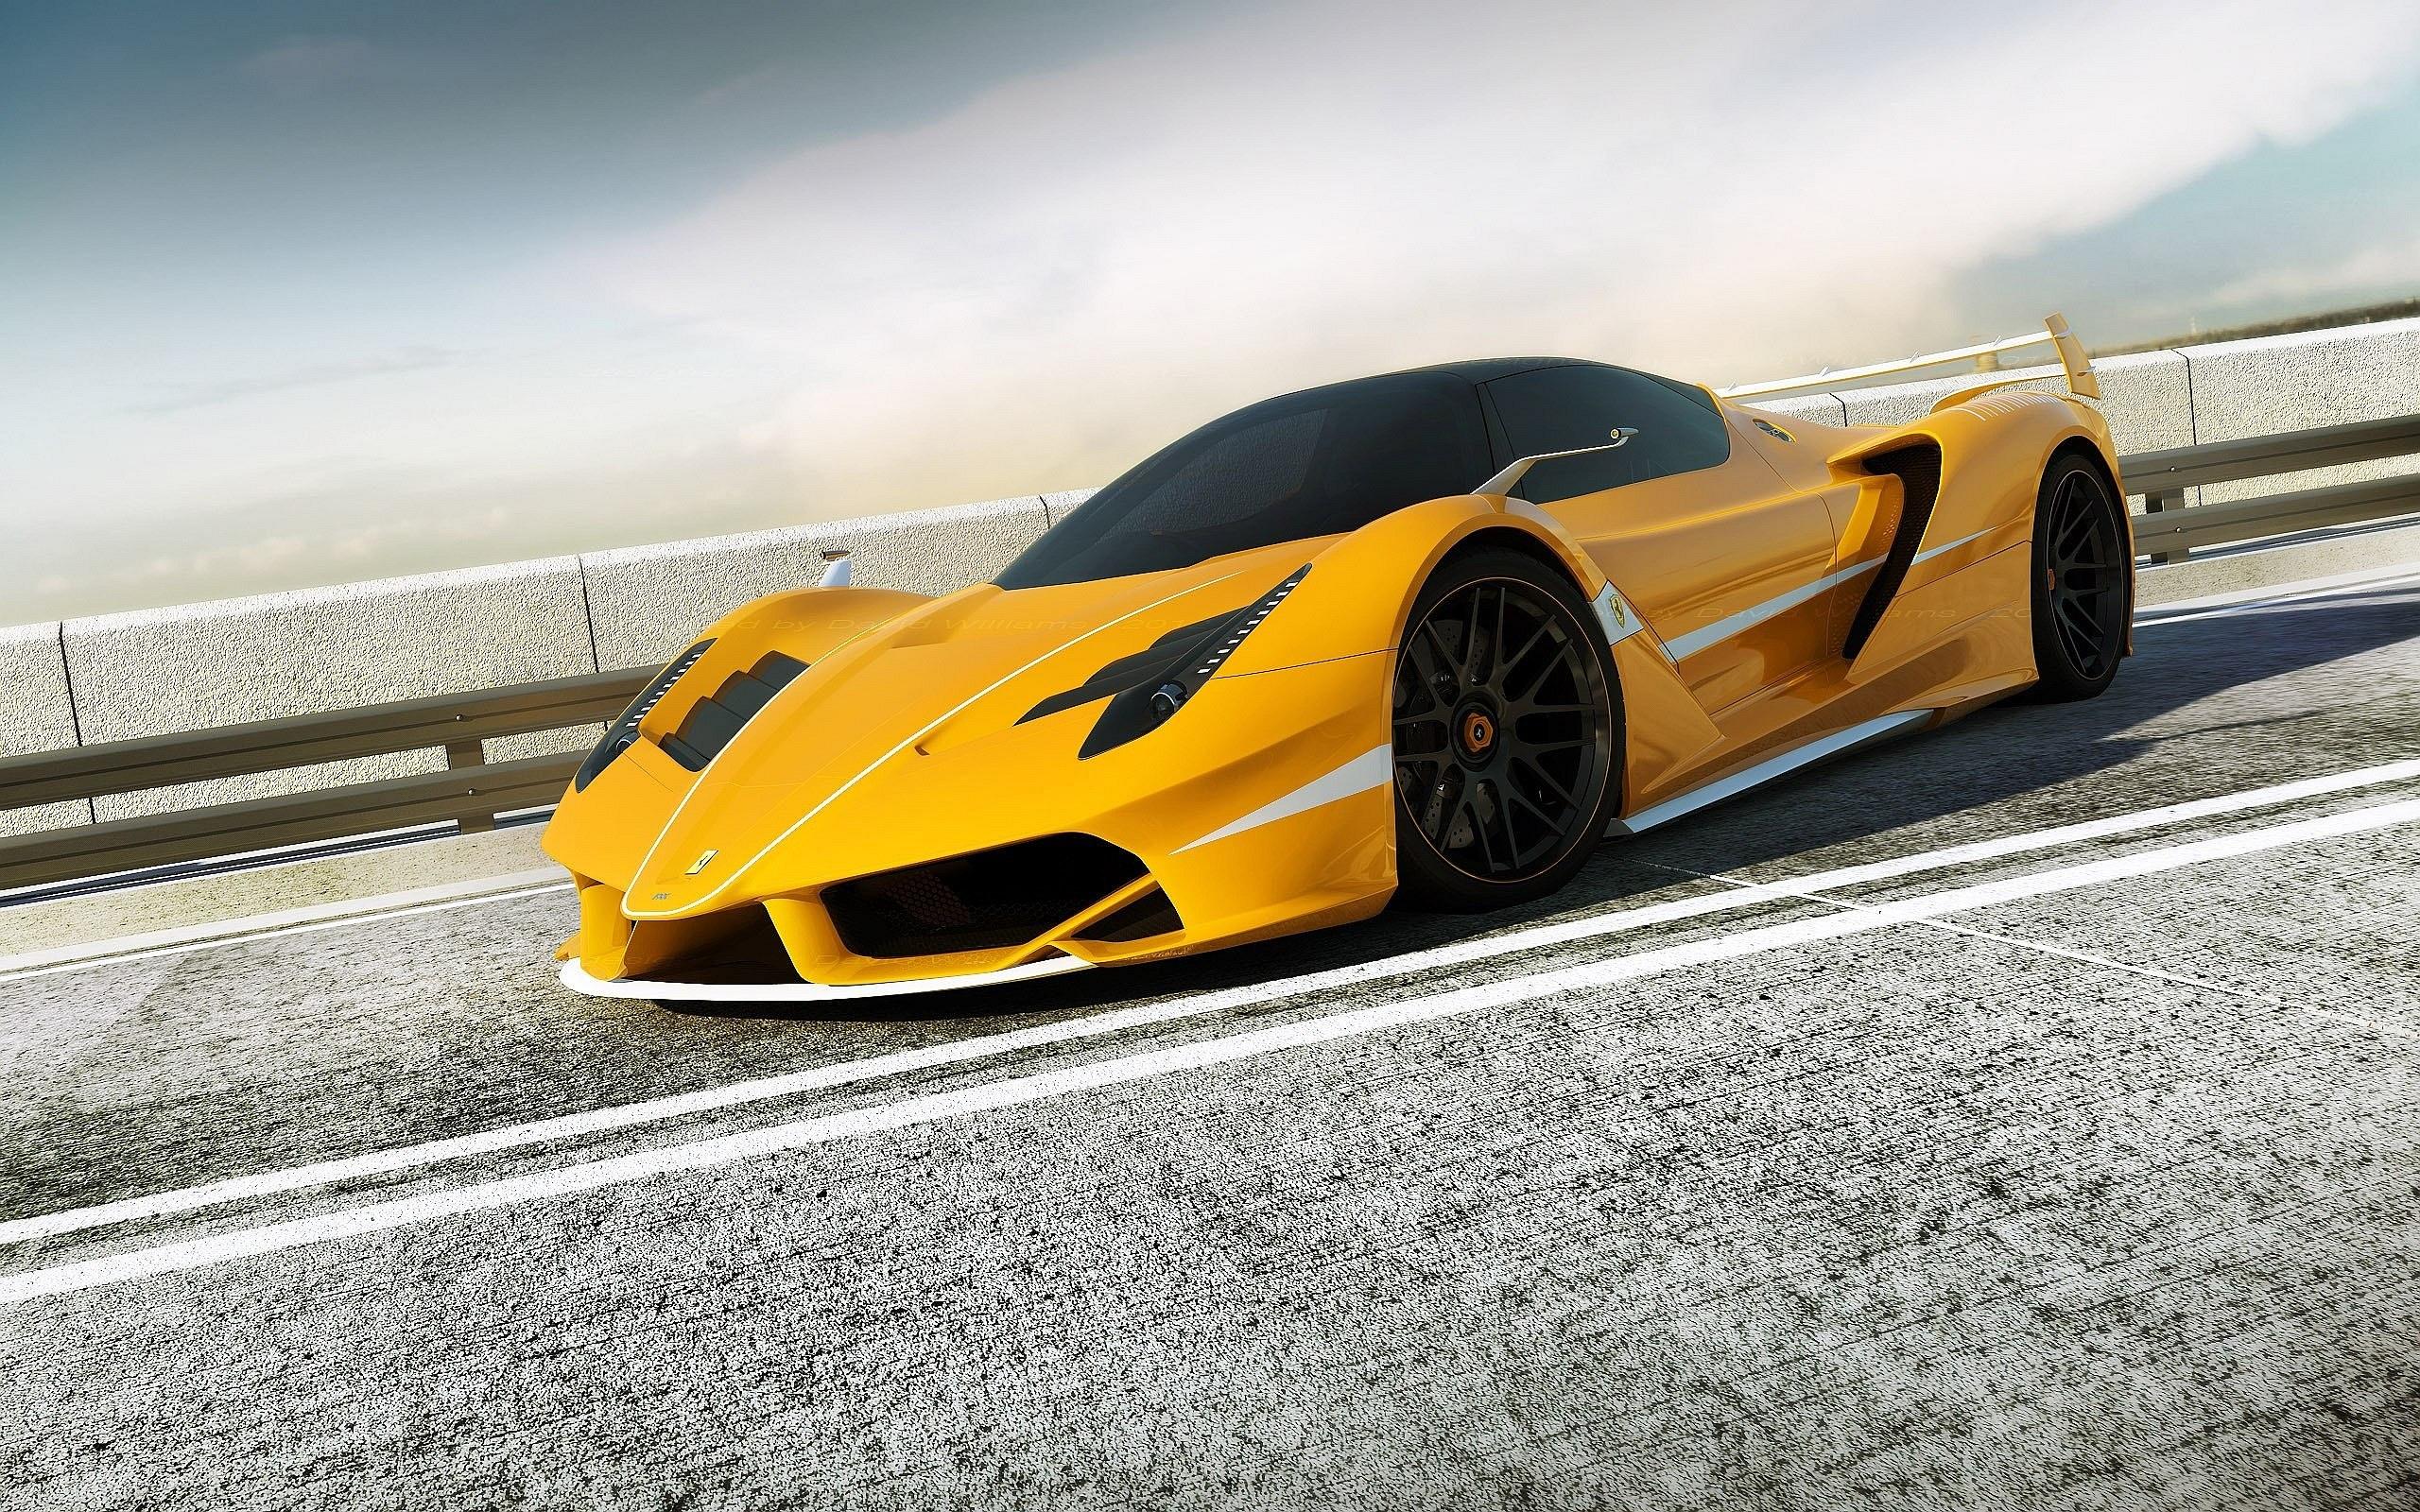 Yellow Ferrari F70